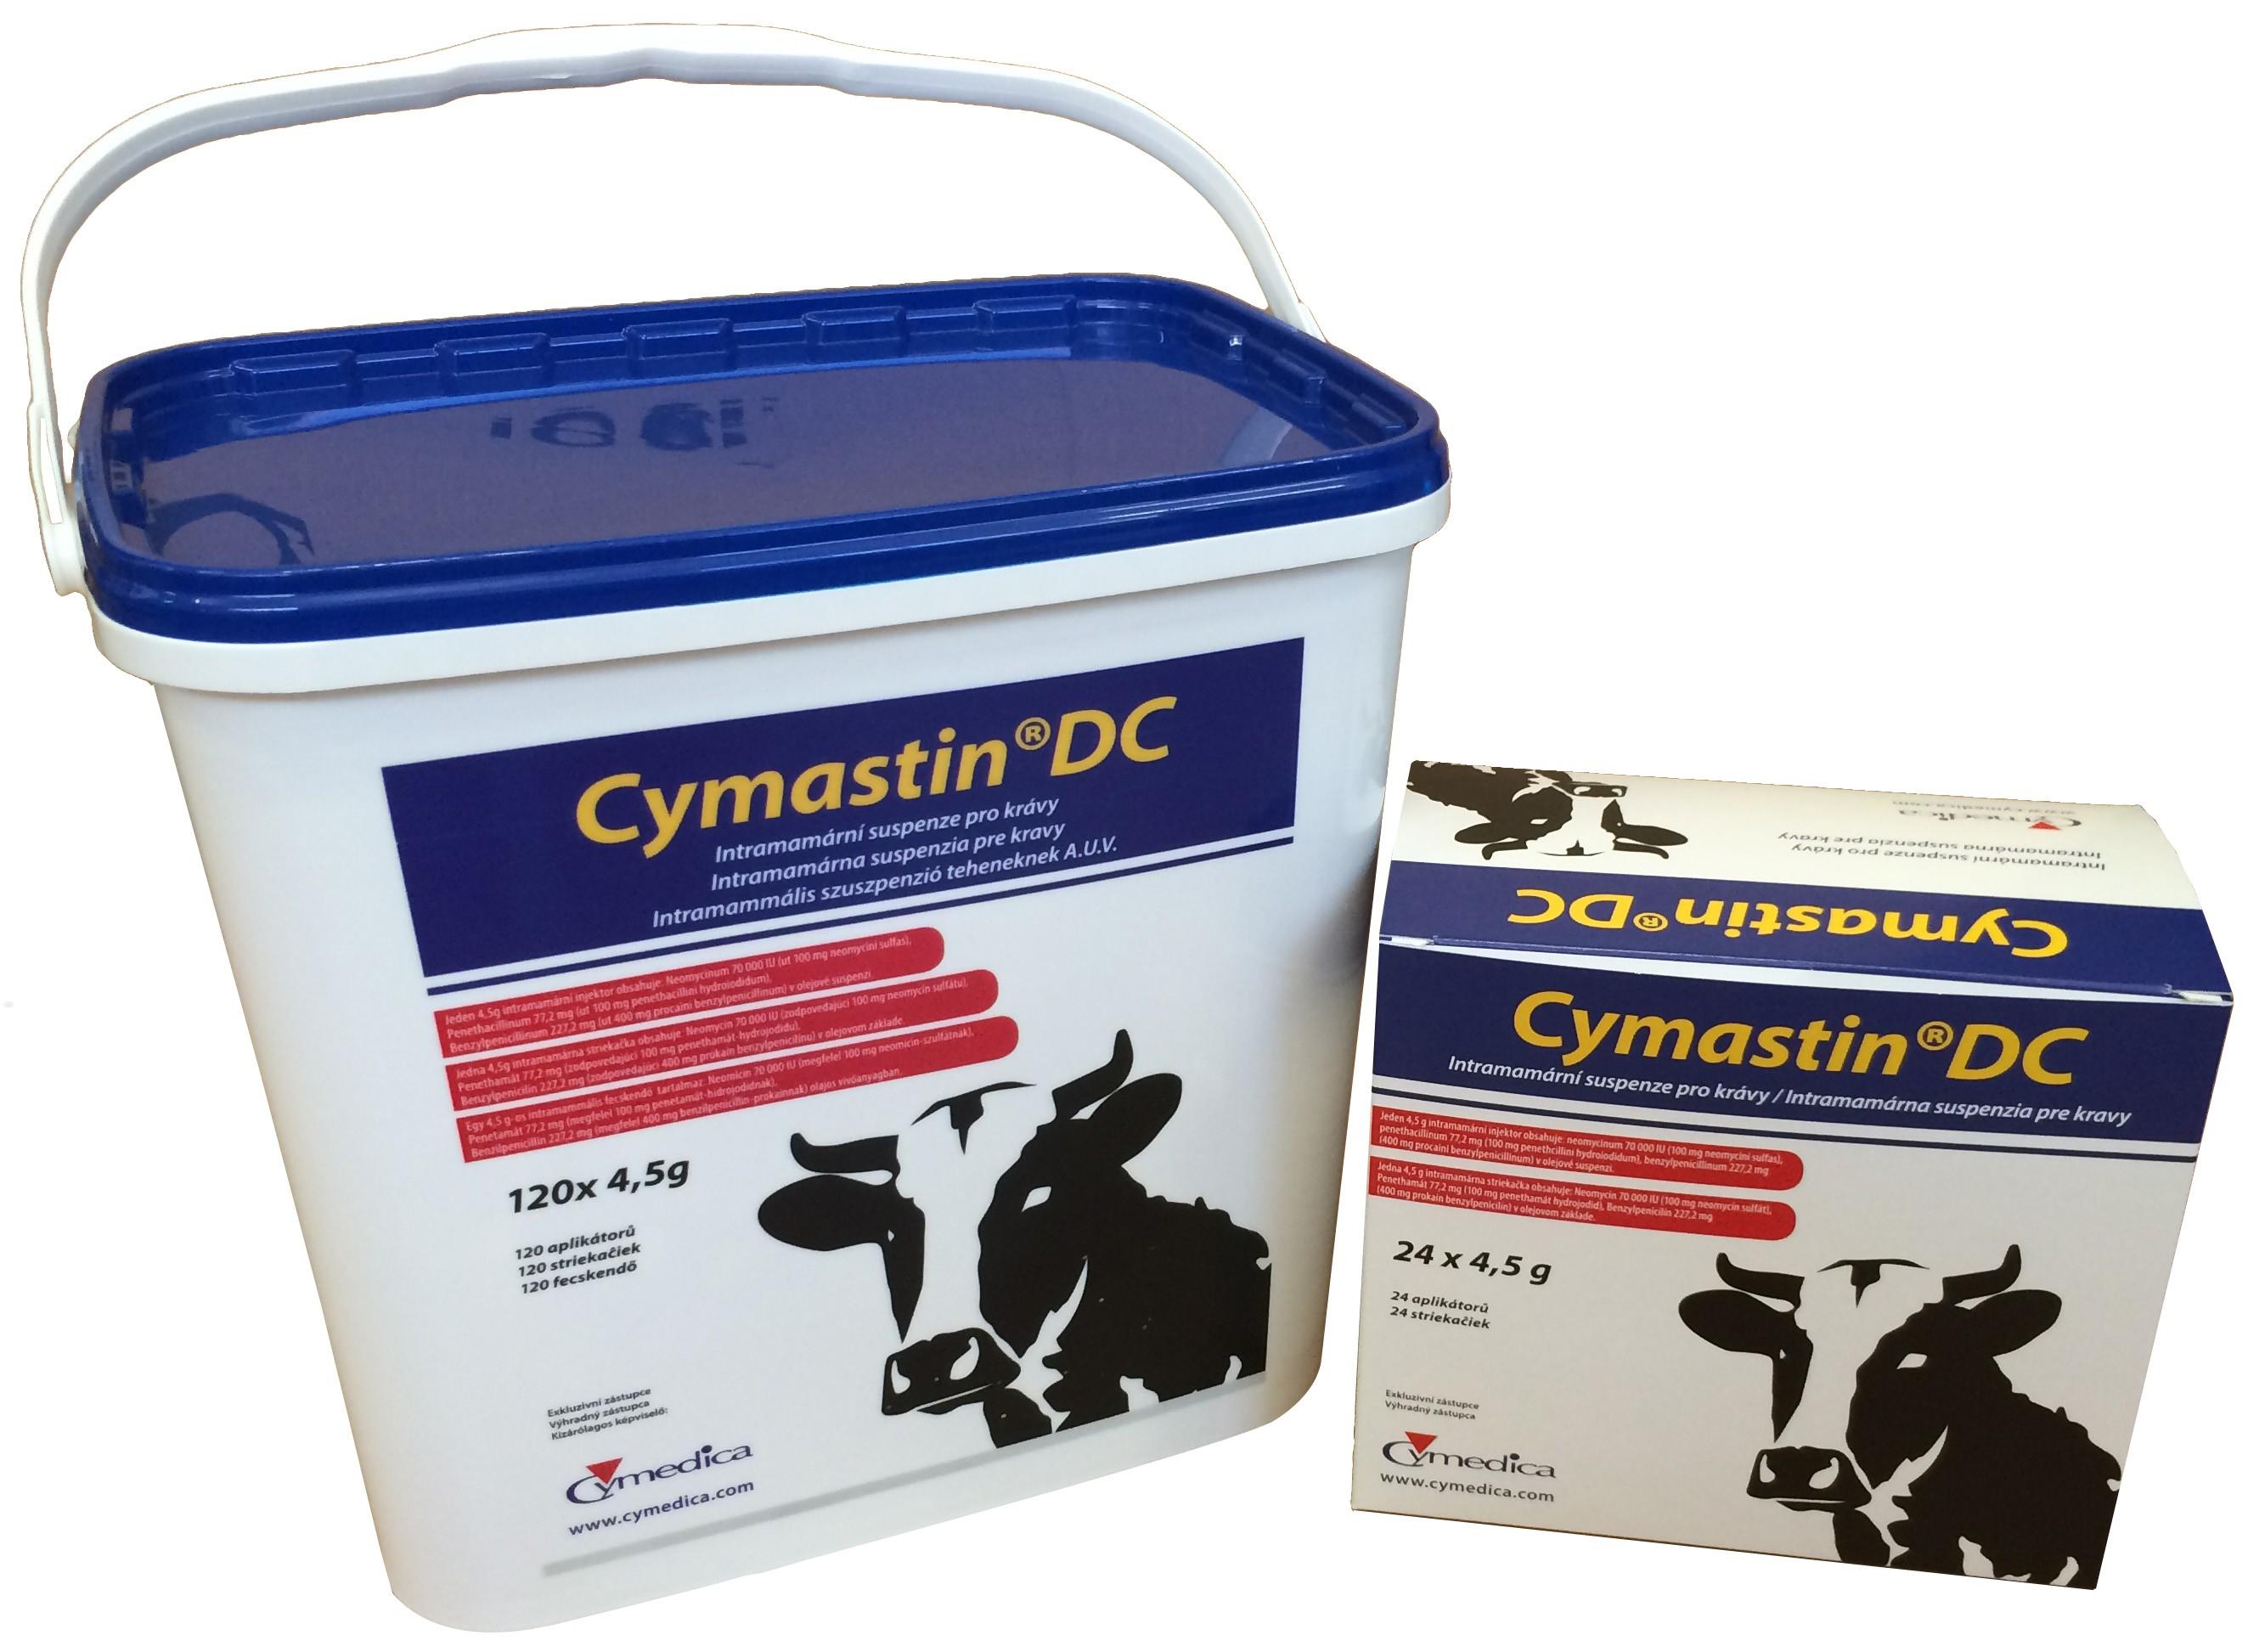 Cymastin